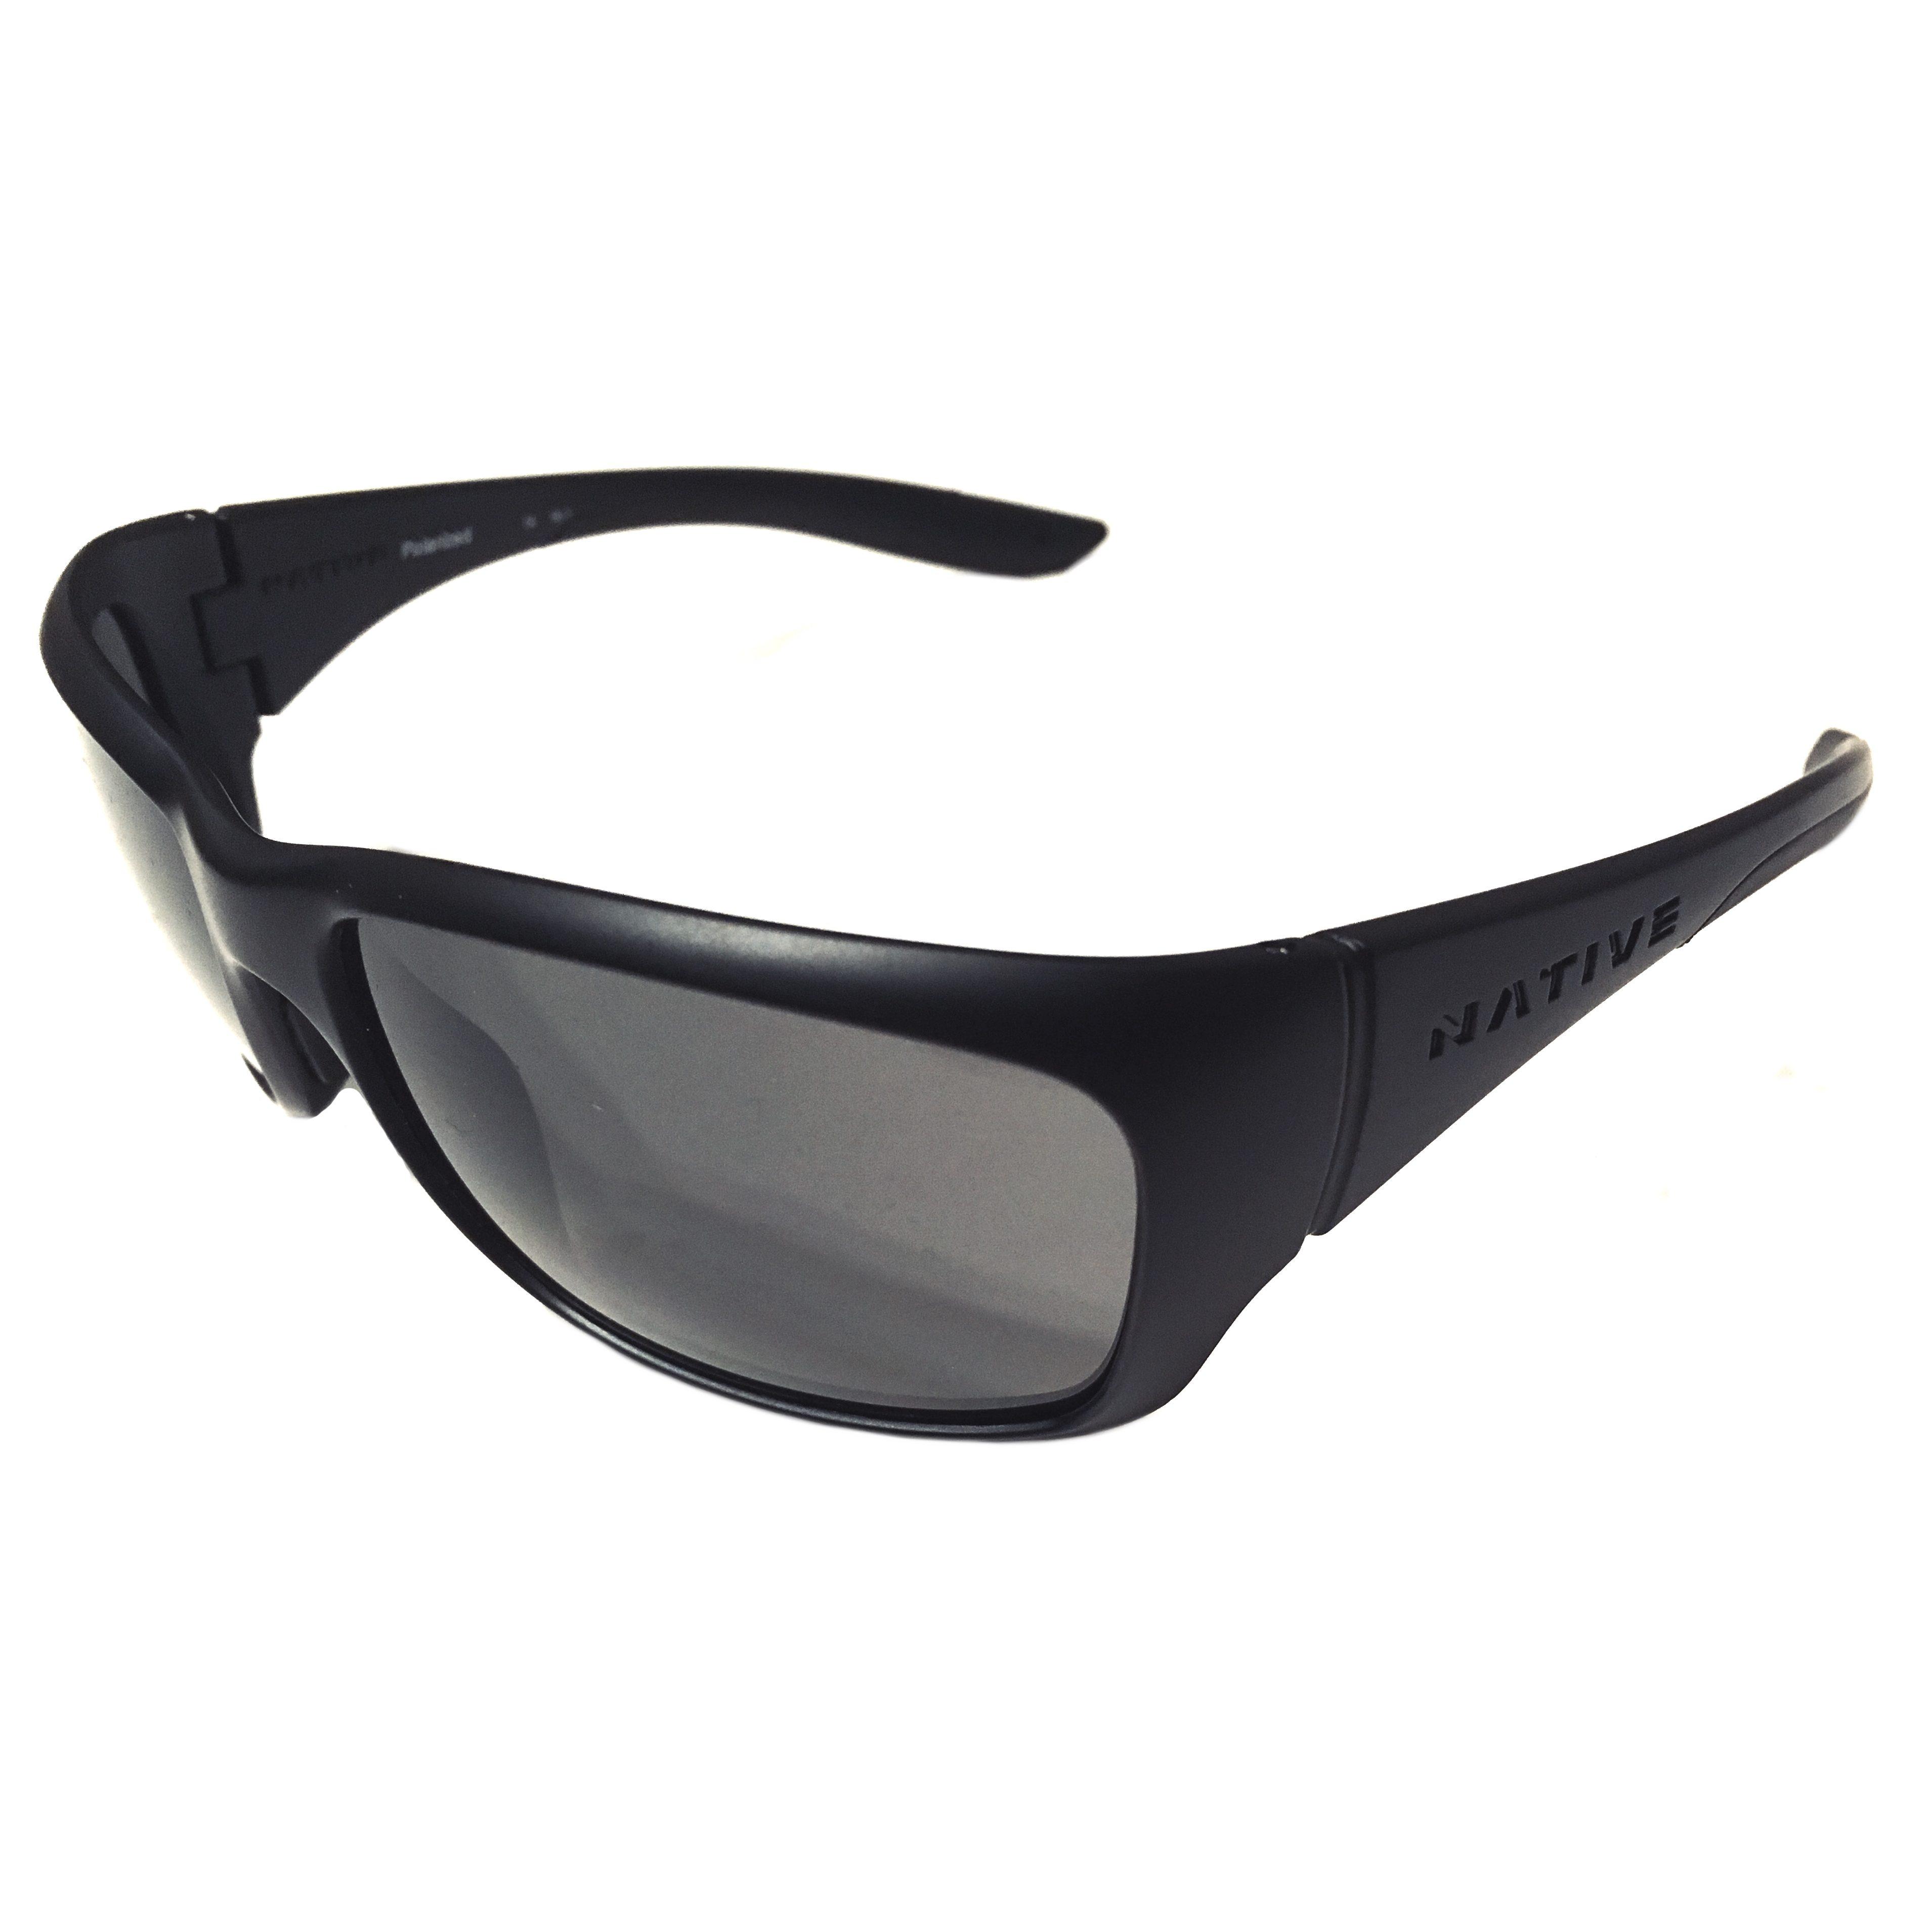 e056727e02 Native Eyewear Kannah Sunglasses – Matte Black Frame – Polarized N3 ...